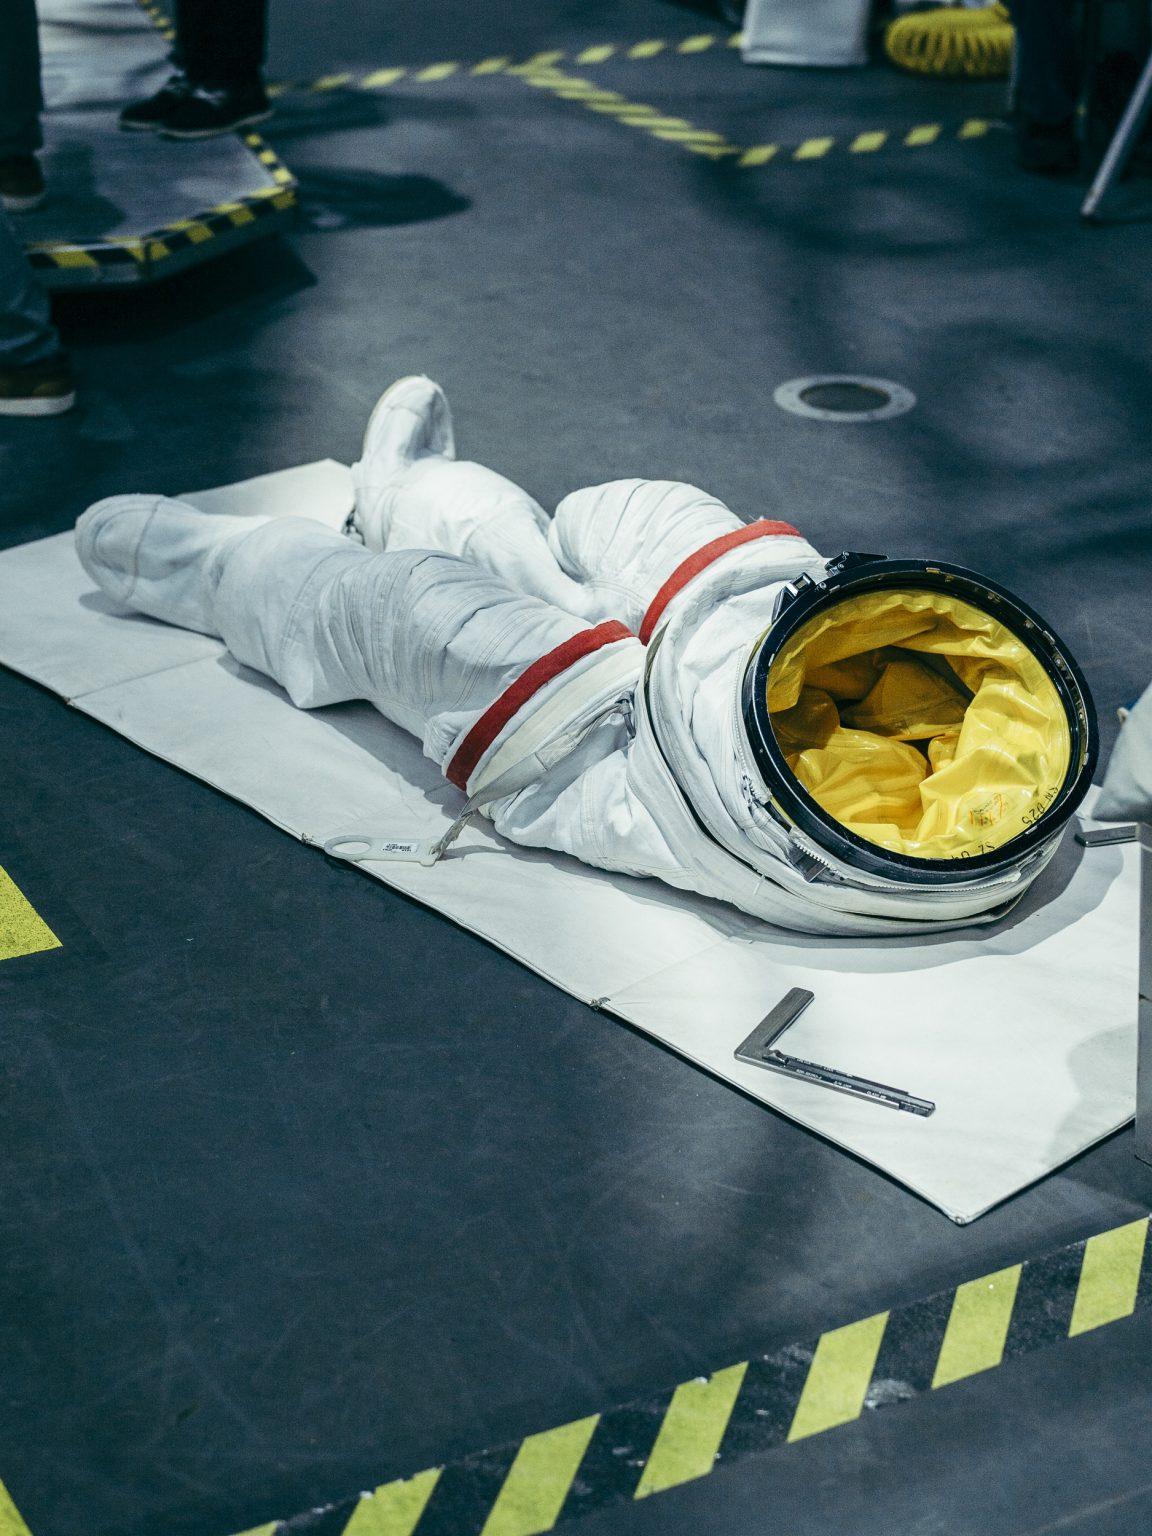 Alexander Gerst's underwater suit. NASA Johnson Space Center, Houston, Texas, USA, 2018 gli addestramenti subacquei.